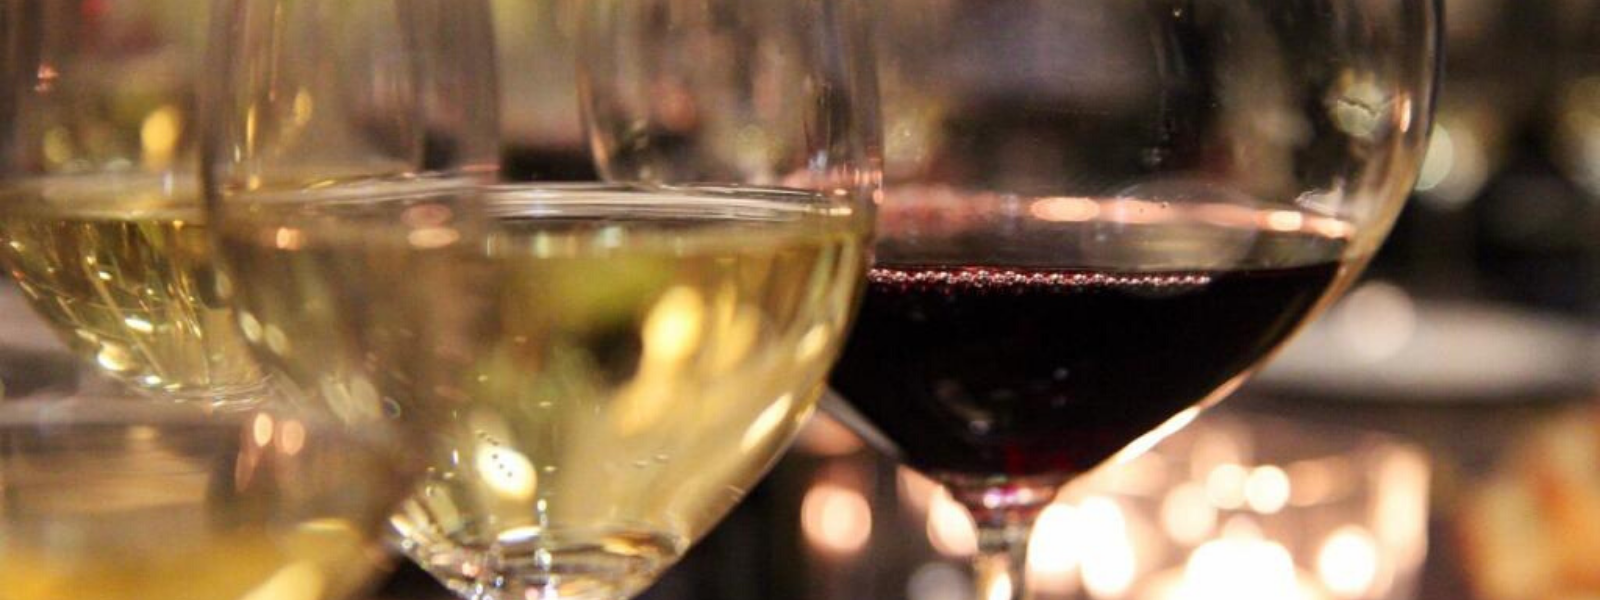 solarancio-vino-vermentino-ilgolosario-press-stampa